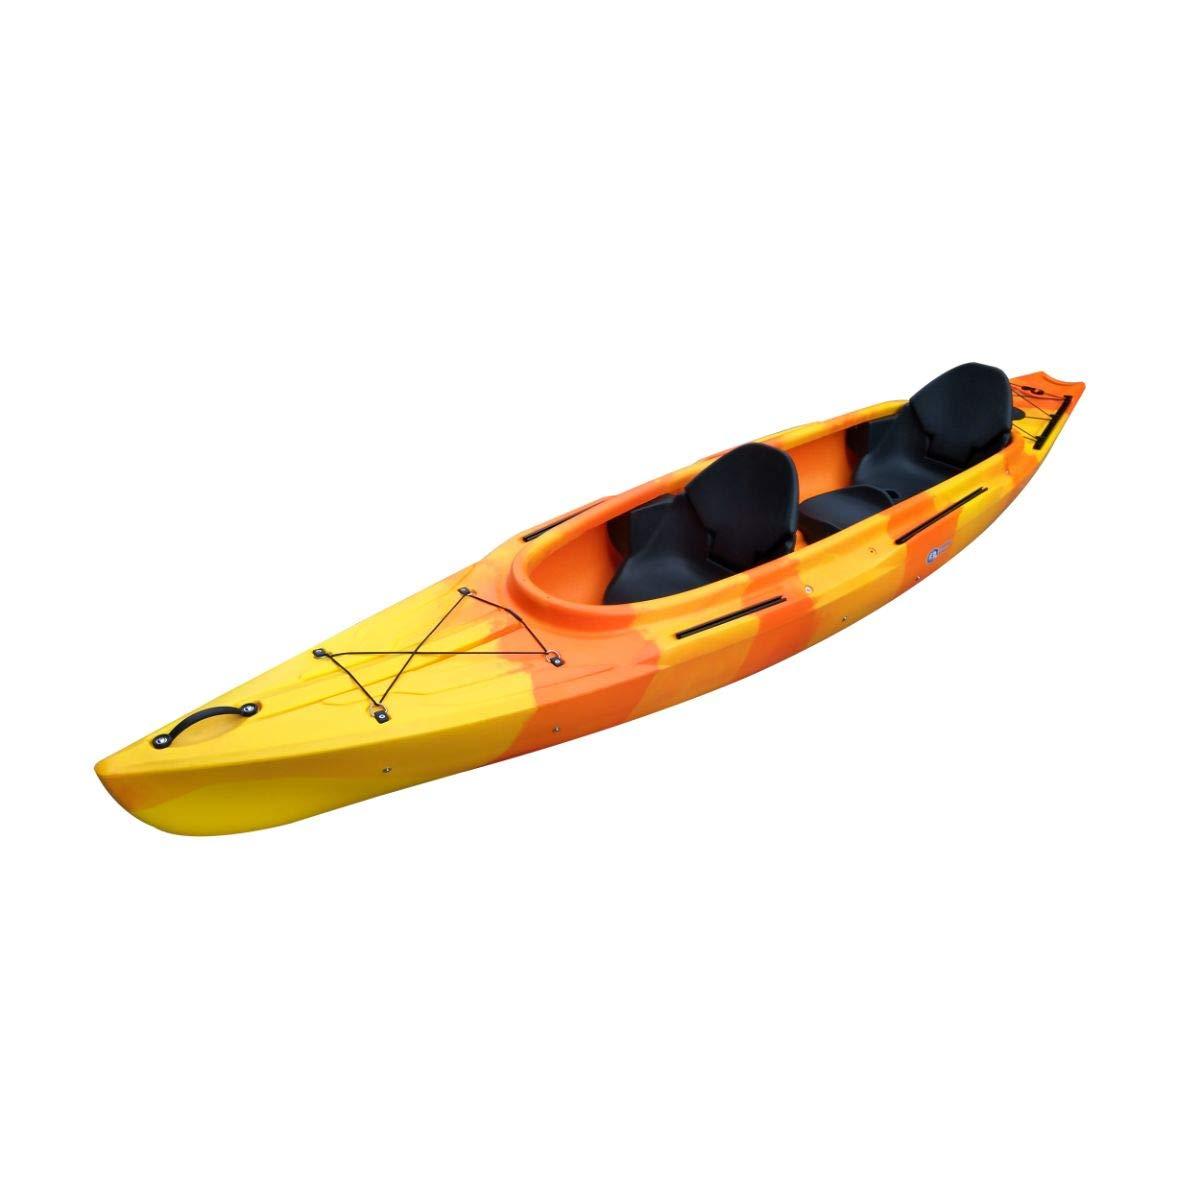 Cambridge Kayaks ES,Gemini Naranja Y Amarillo Kayak Canoa Doble ...